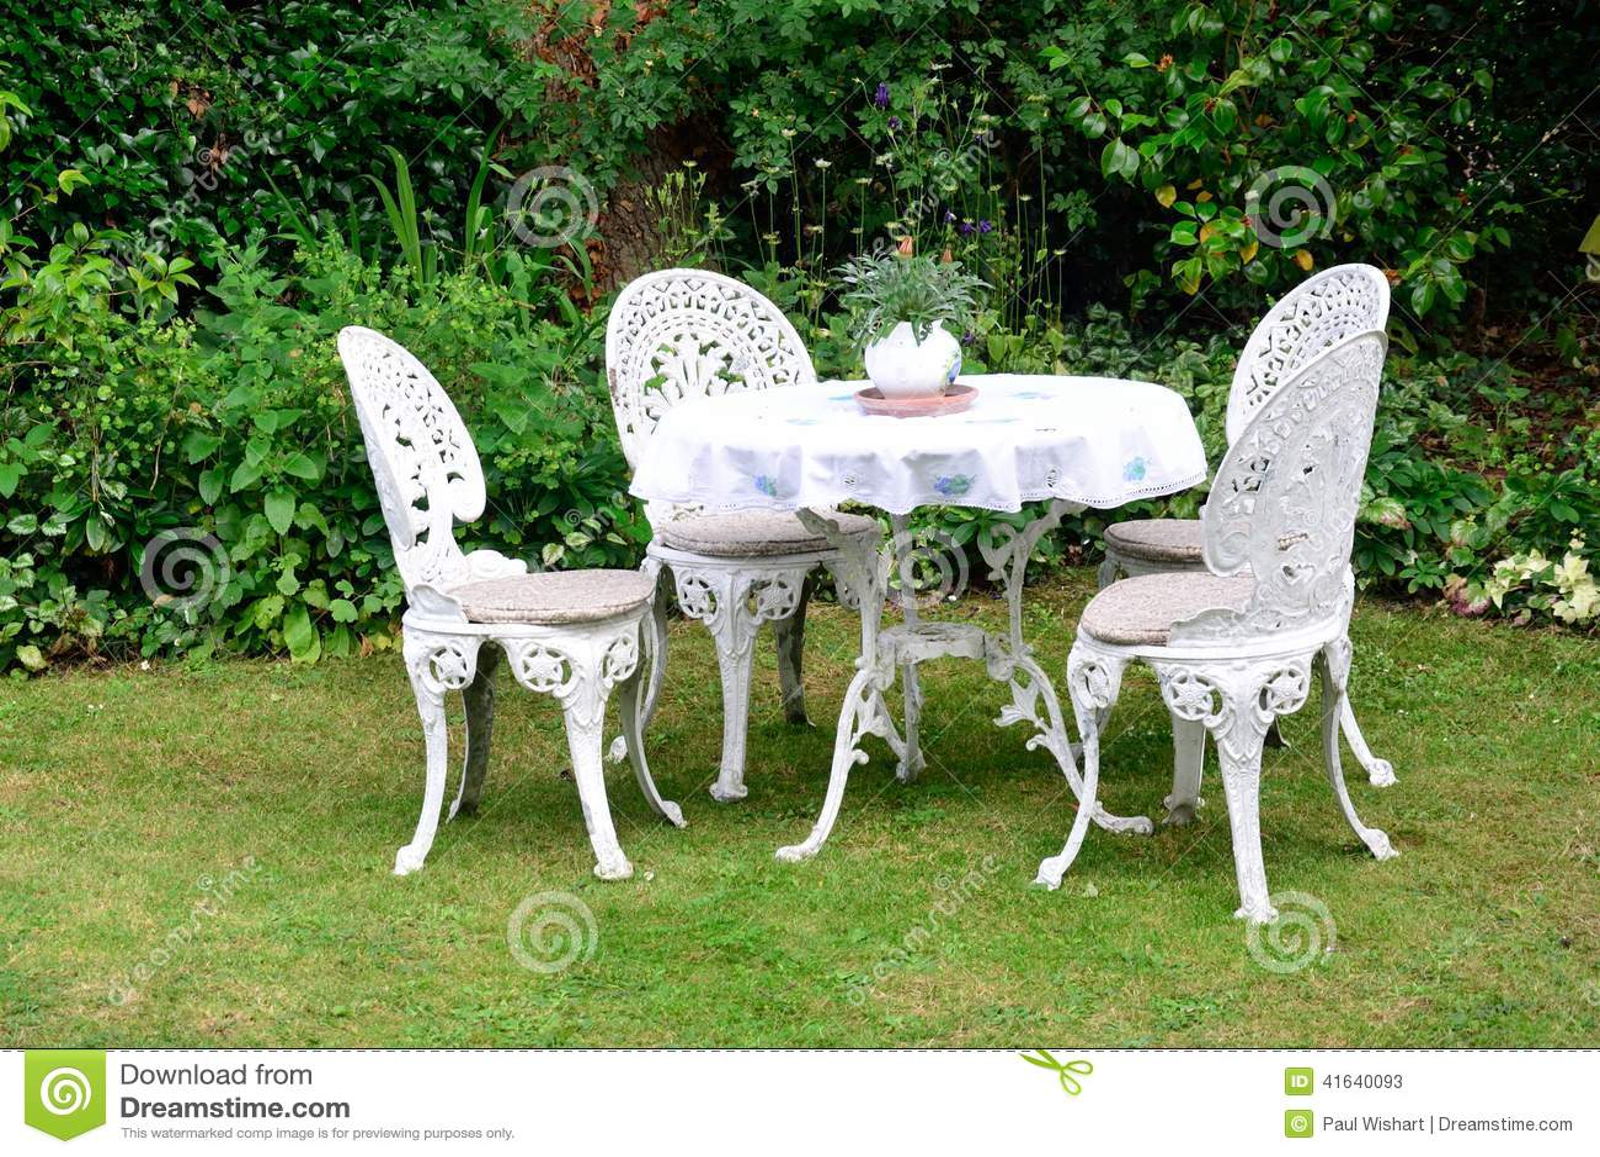 Sedie Da Giardino In Ghisa.Sedie Di Giardino Del Ghisa Immagine Stock Immagine Di Presidenza